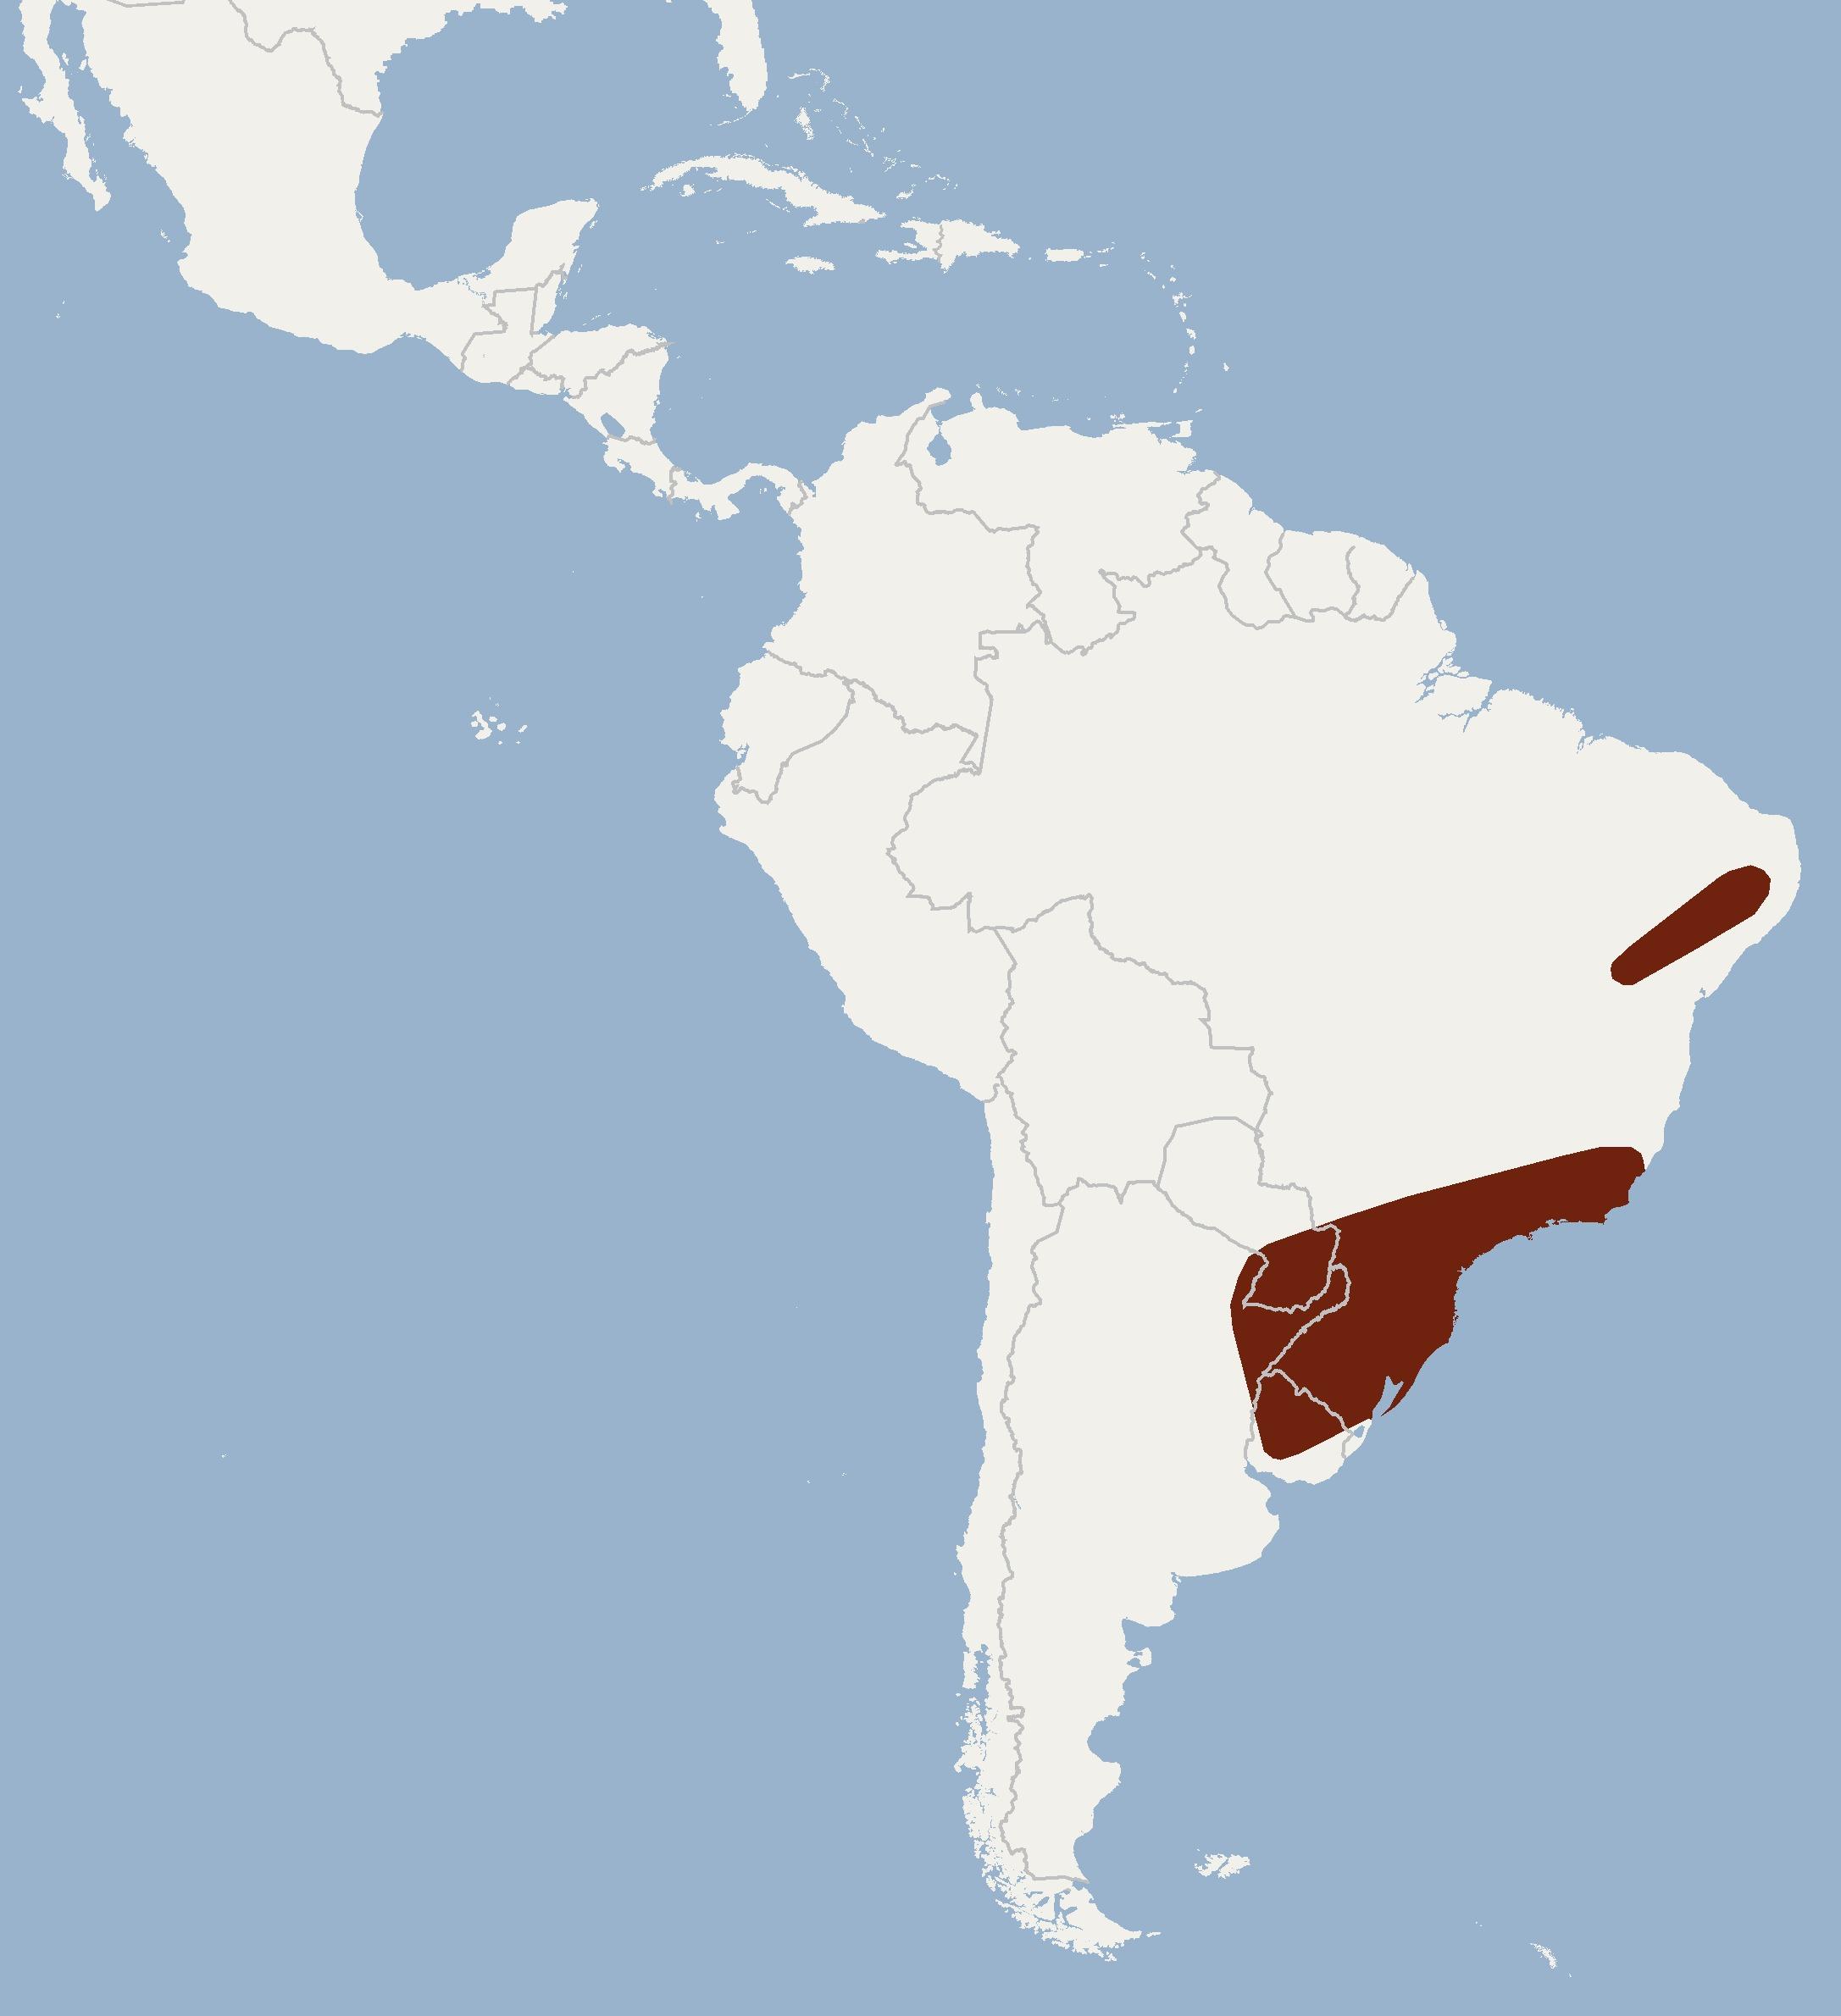 "<span class=""translation_missing"" title=""translation missing: en.medium.untitled.map_image_of, page_name: Red Myotis"">Map Image Of</span>"